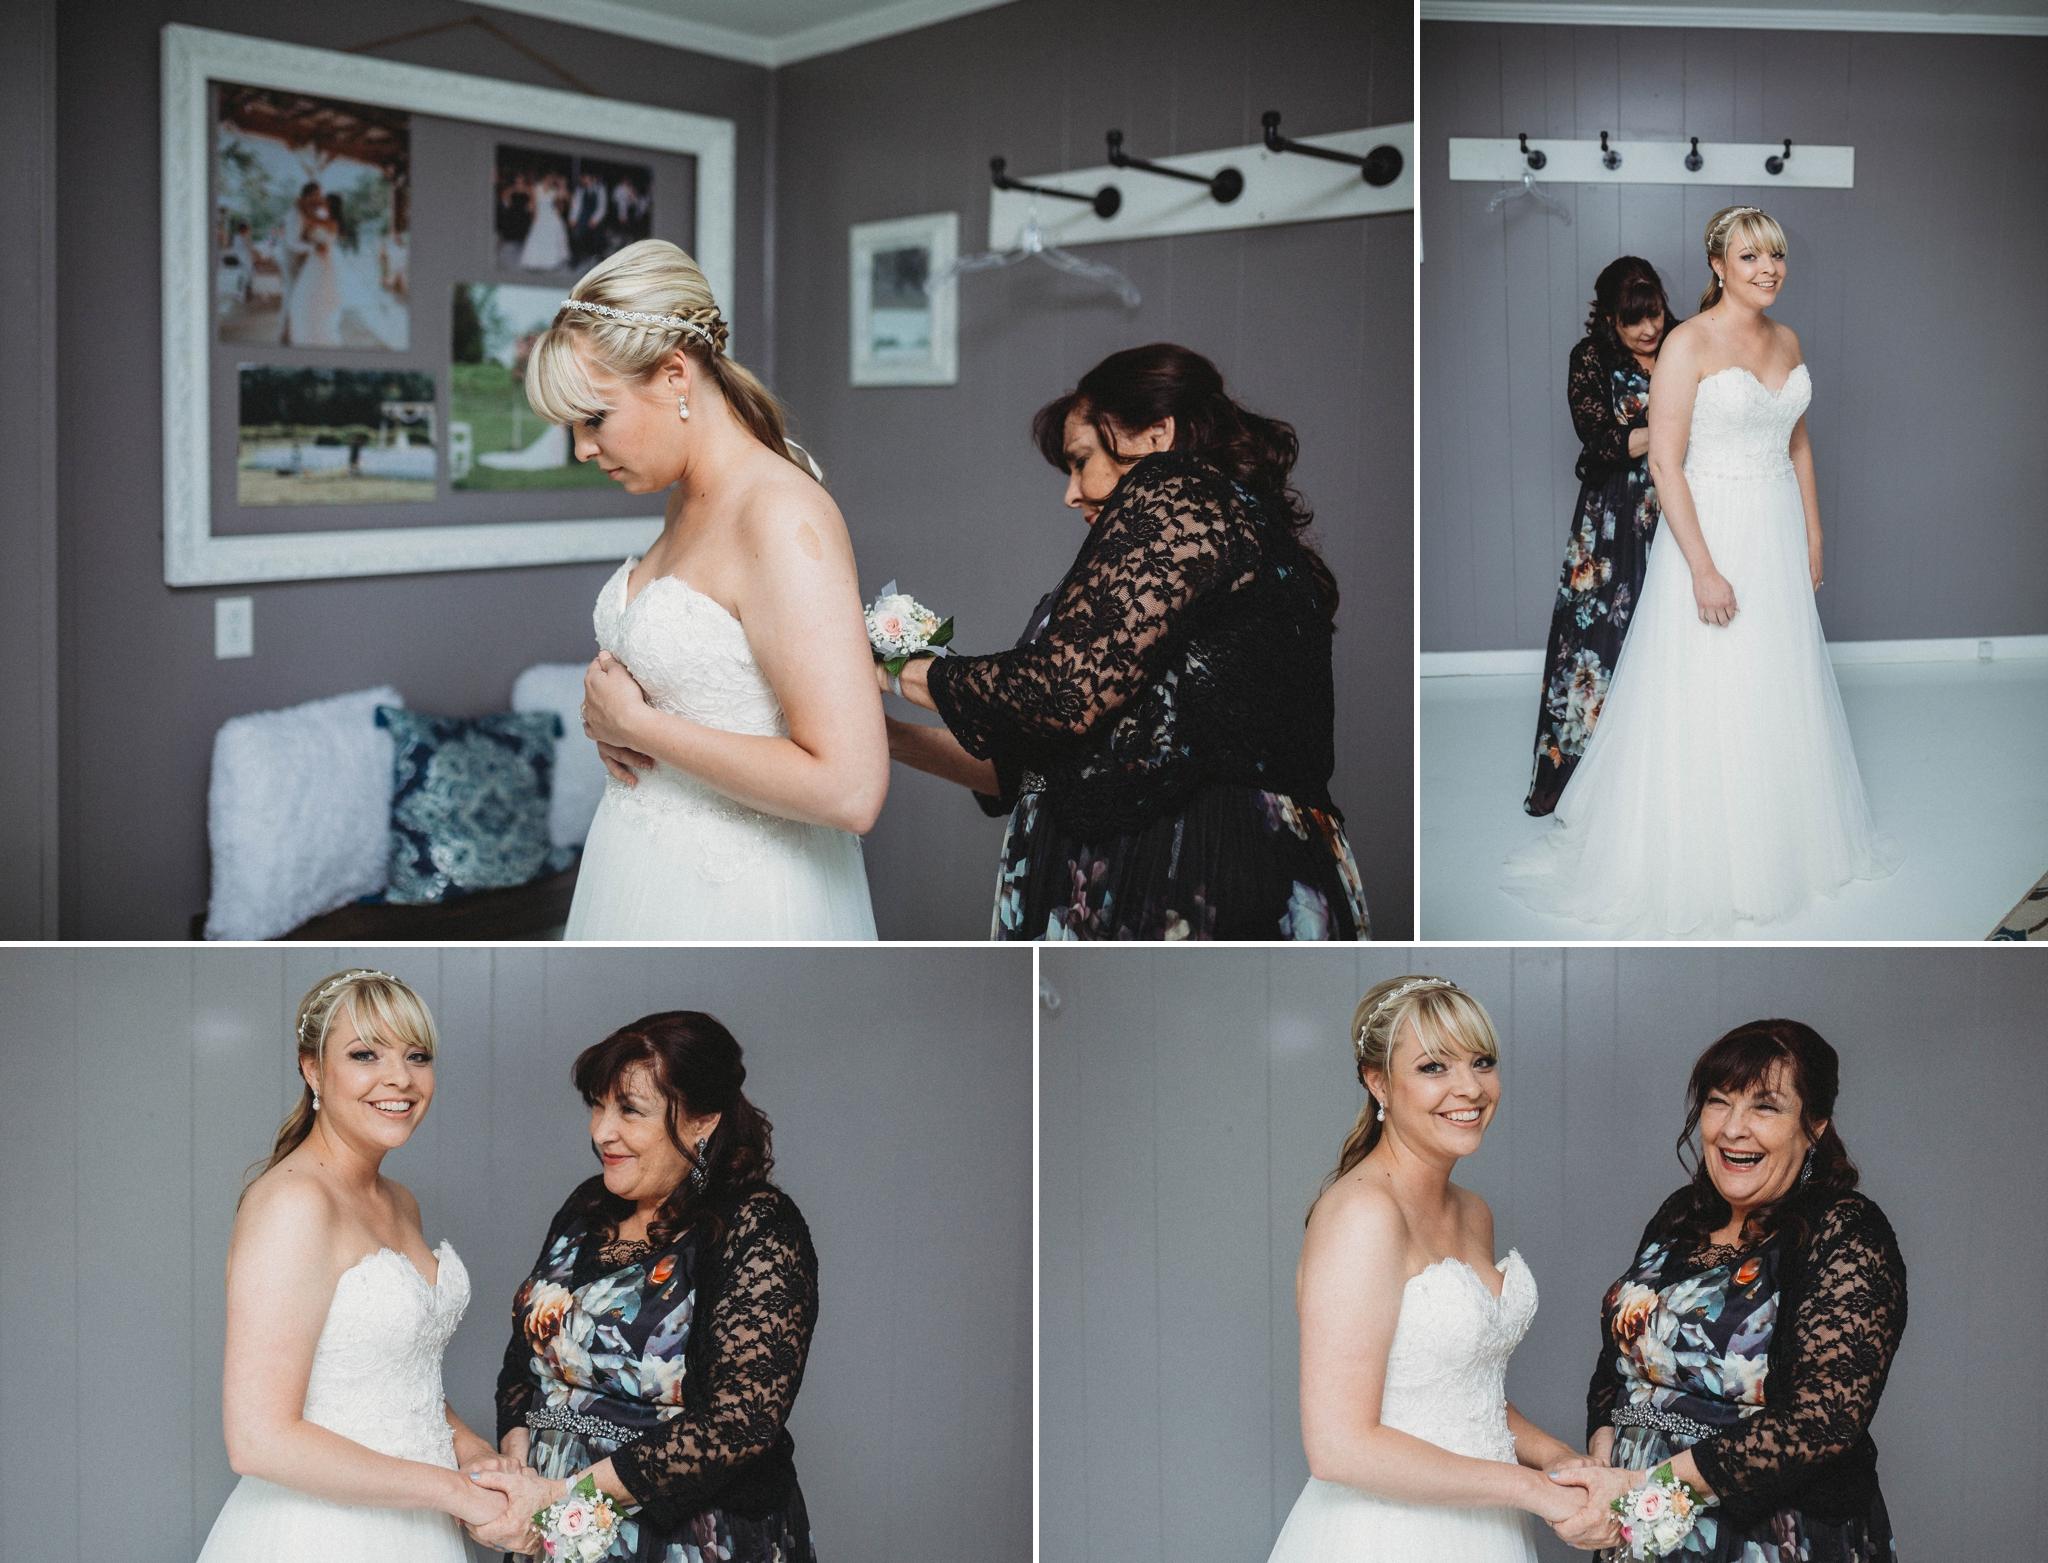 Wedding at Treehouse Vineyards in Monroe, NC - Charlotte North Carolina Photographer